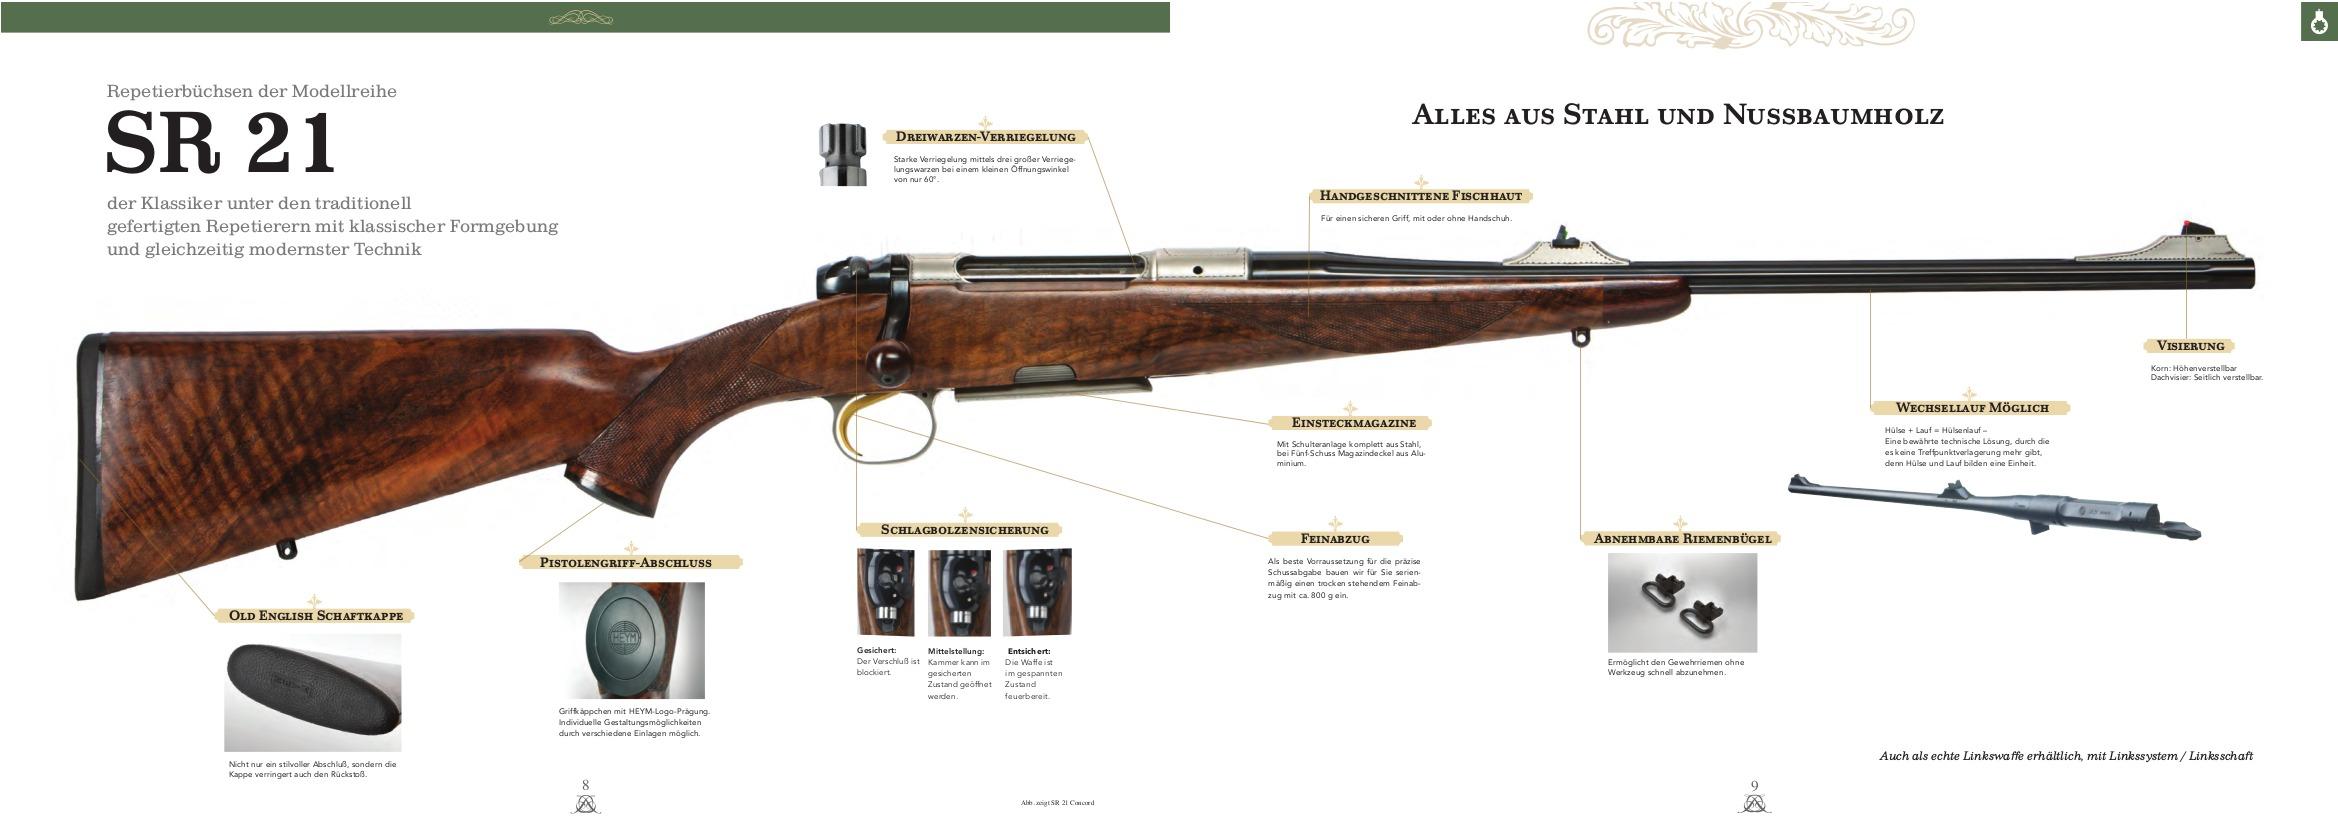 Heym SR21 sporting rifle